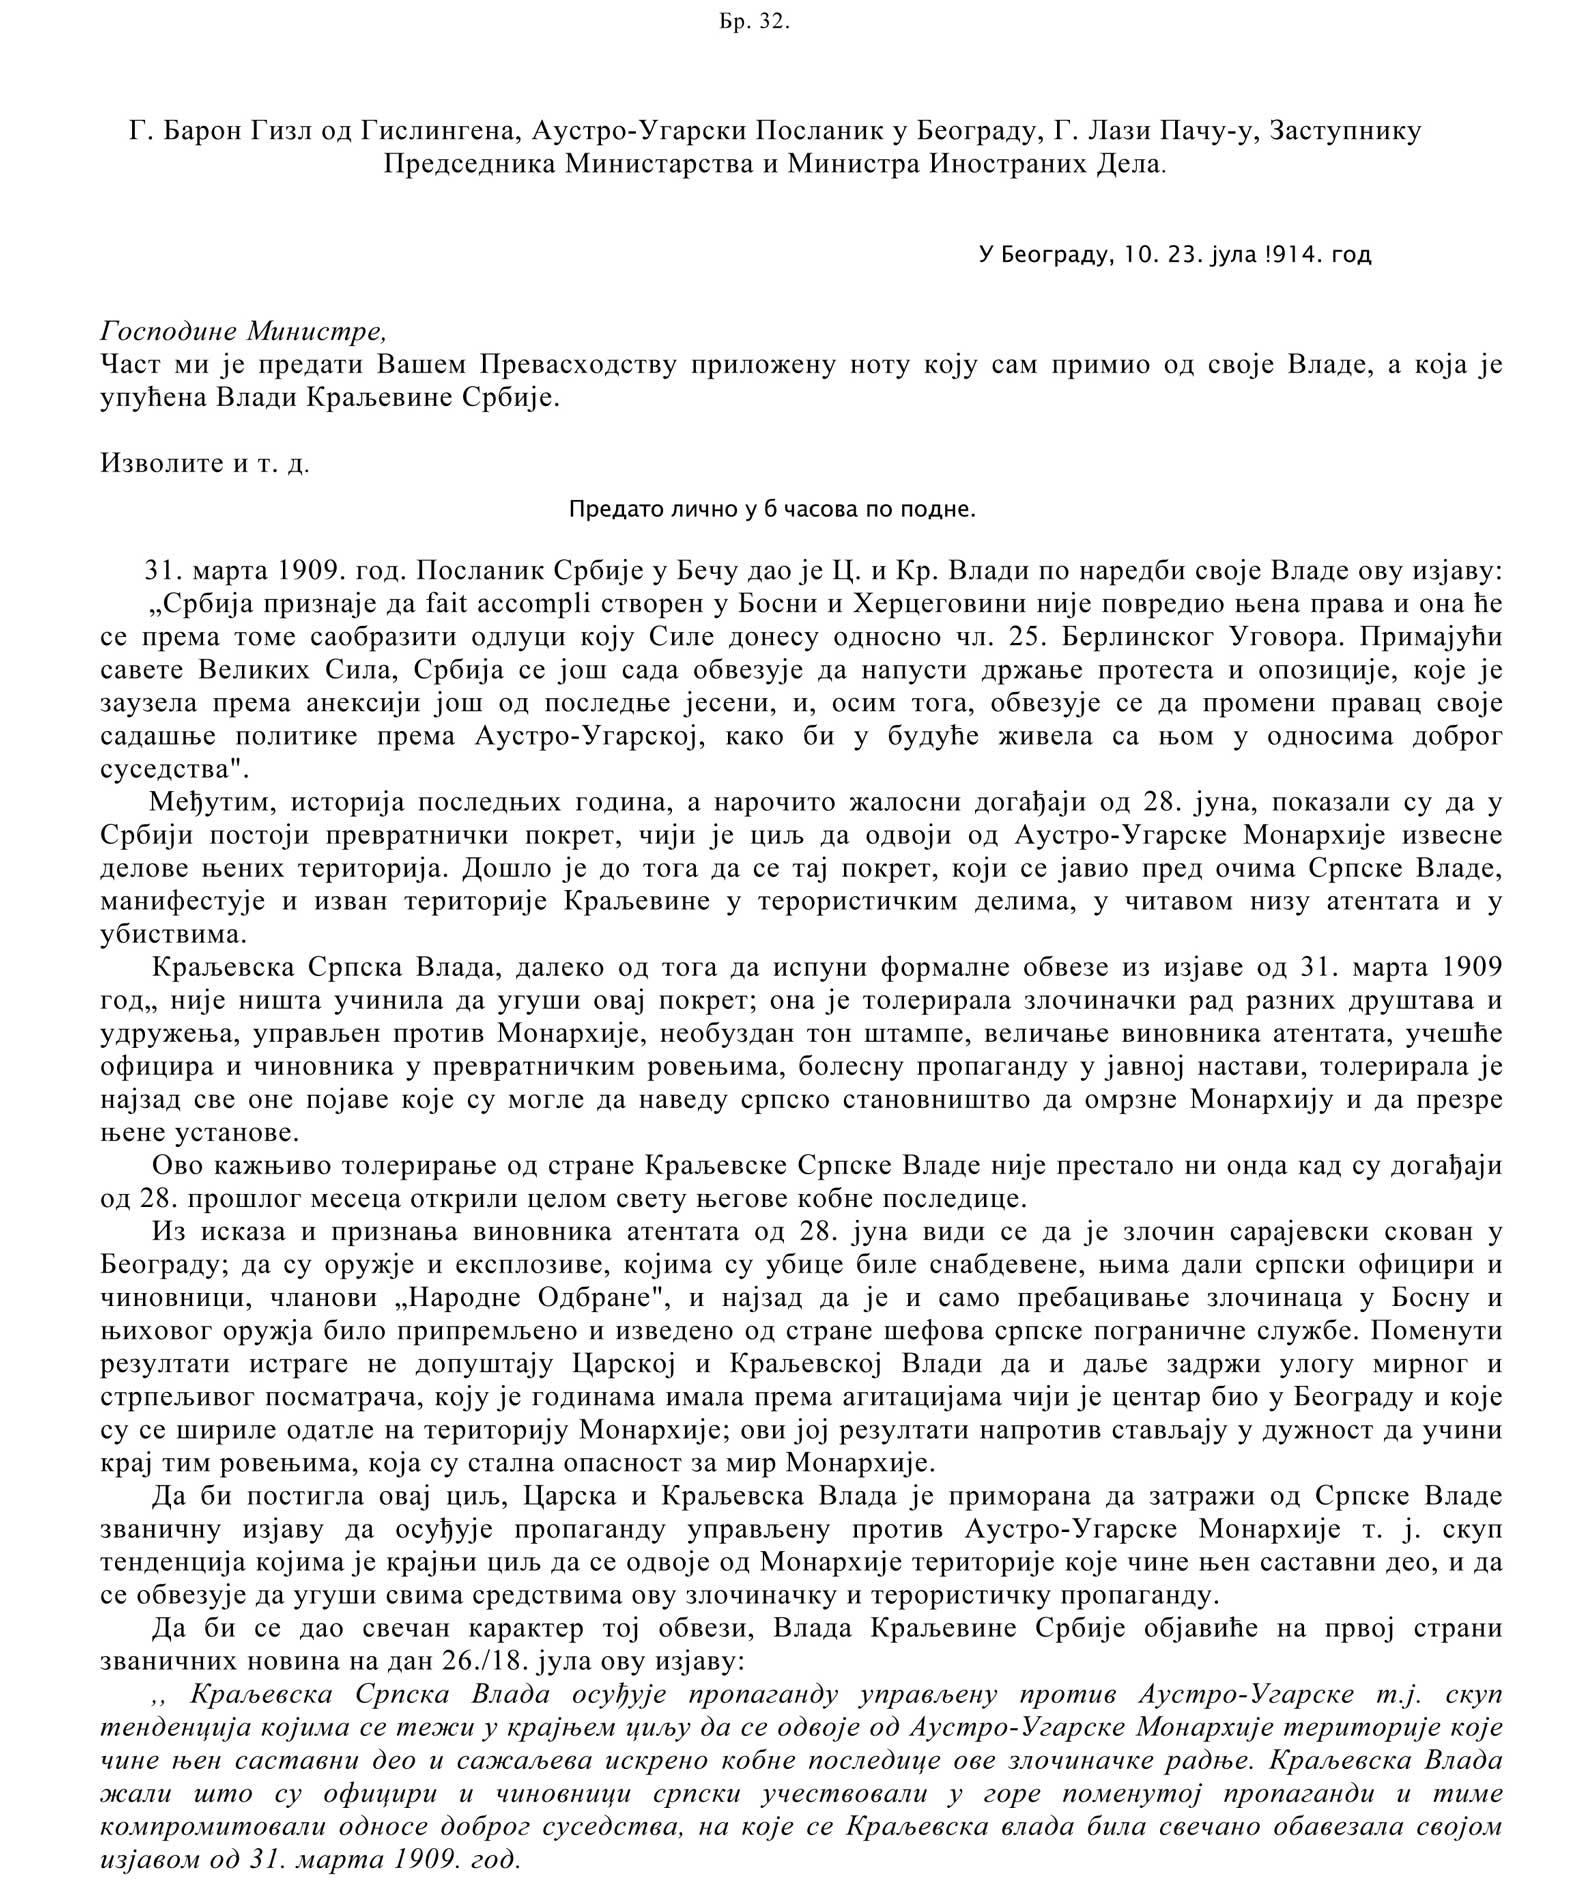 Austrohungarian ultimatum to Serbia and Serbian response